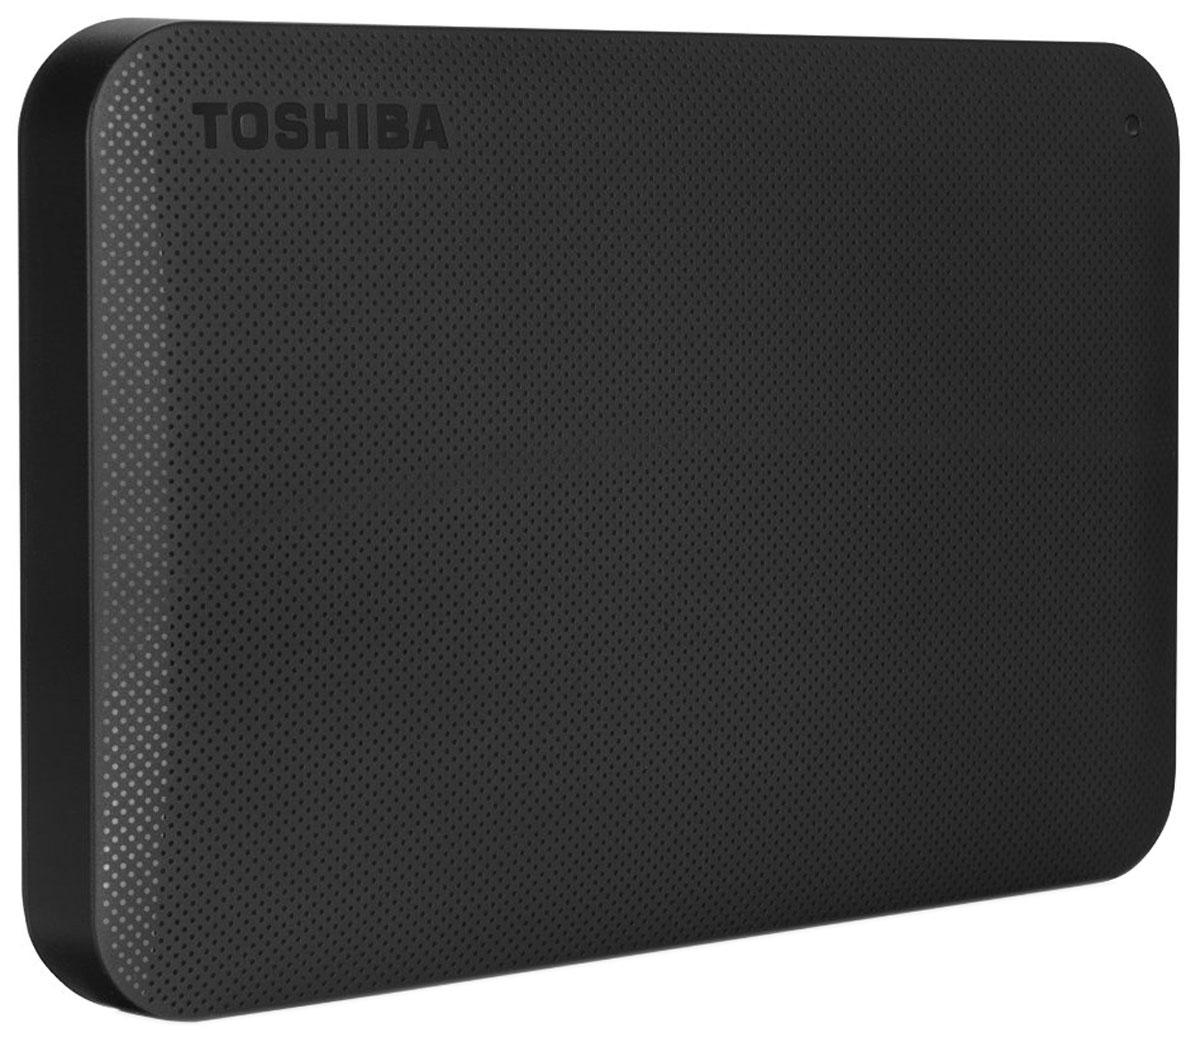 Внешний жесткий диск Toshiba Canvio Ready 2TB, HDTP220EK3CA, black цены онлайн